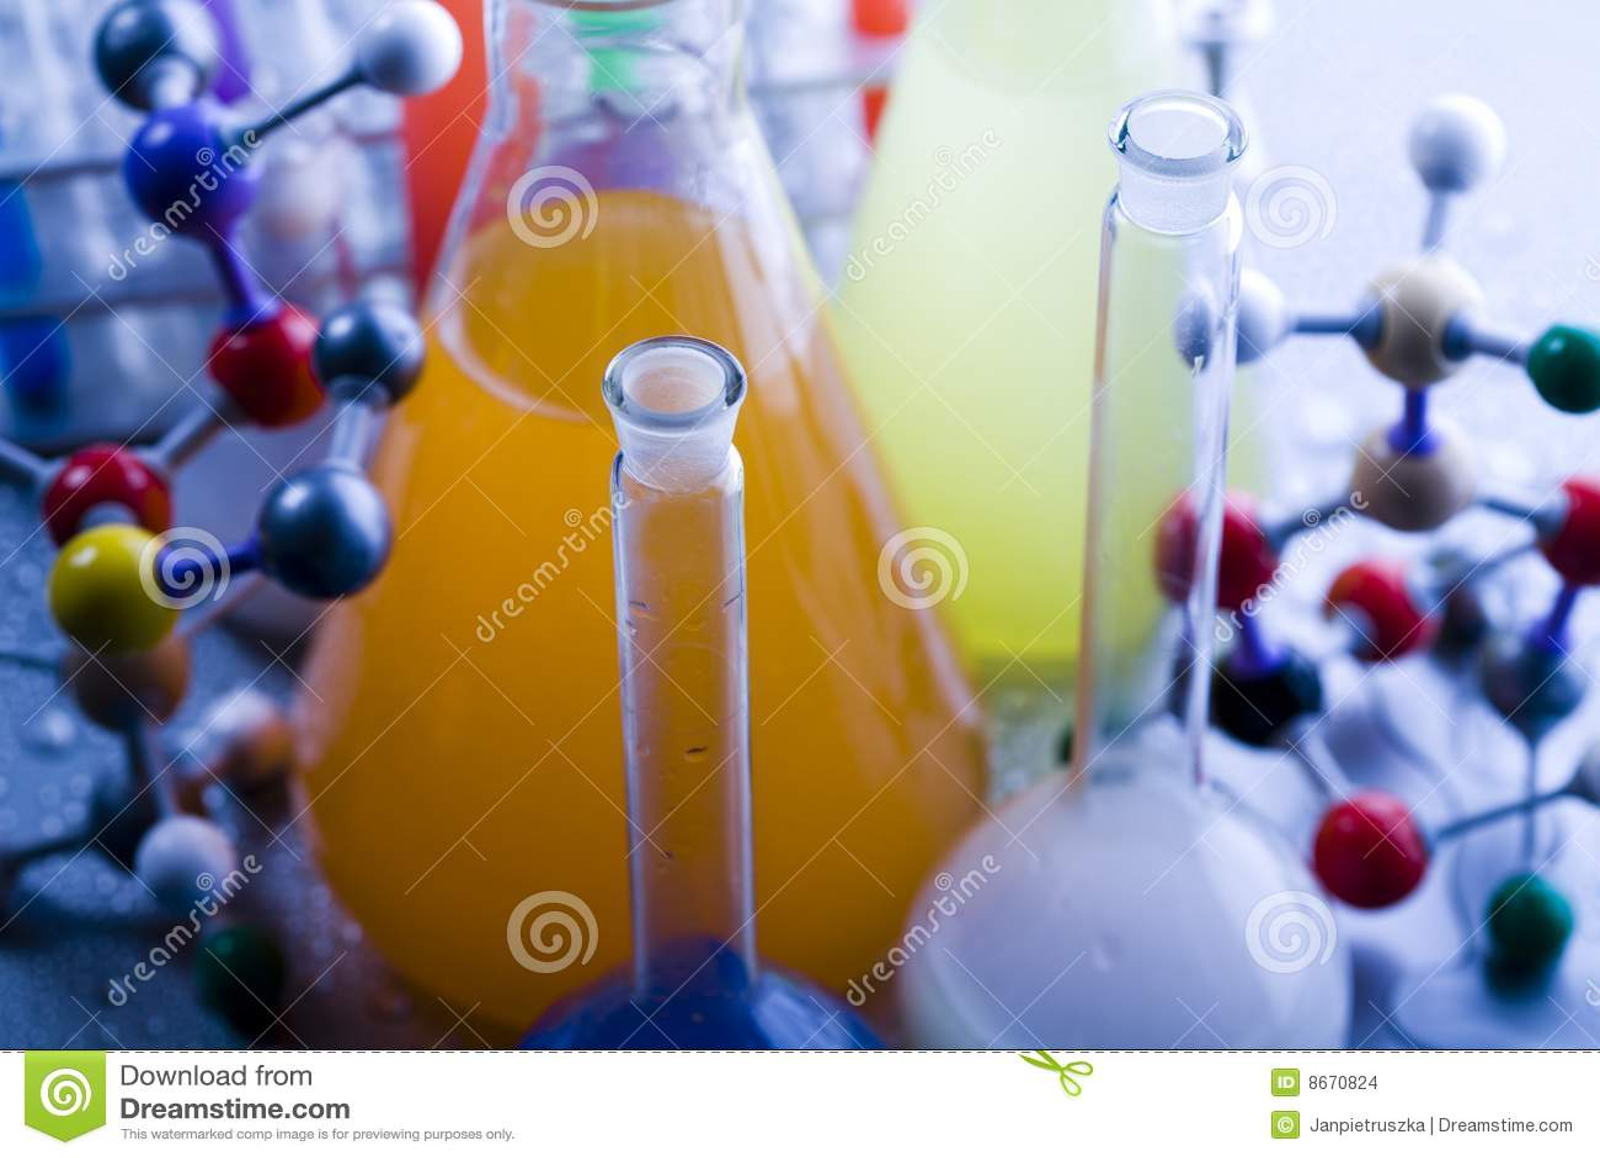 Chimie et biologie